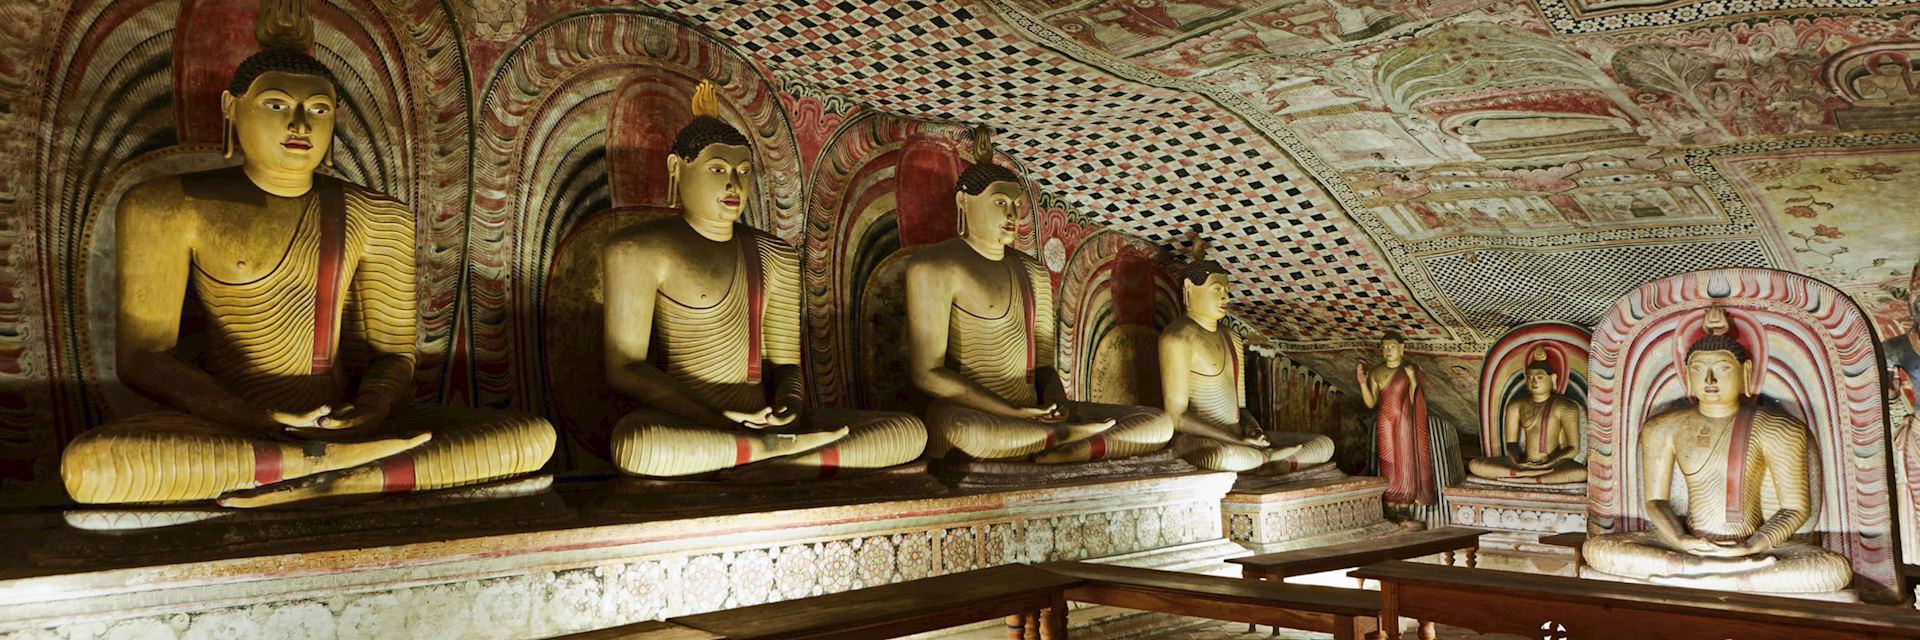 Buddha statues inside Dambulla Cave